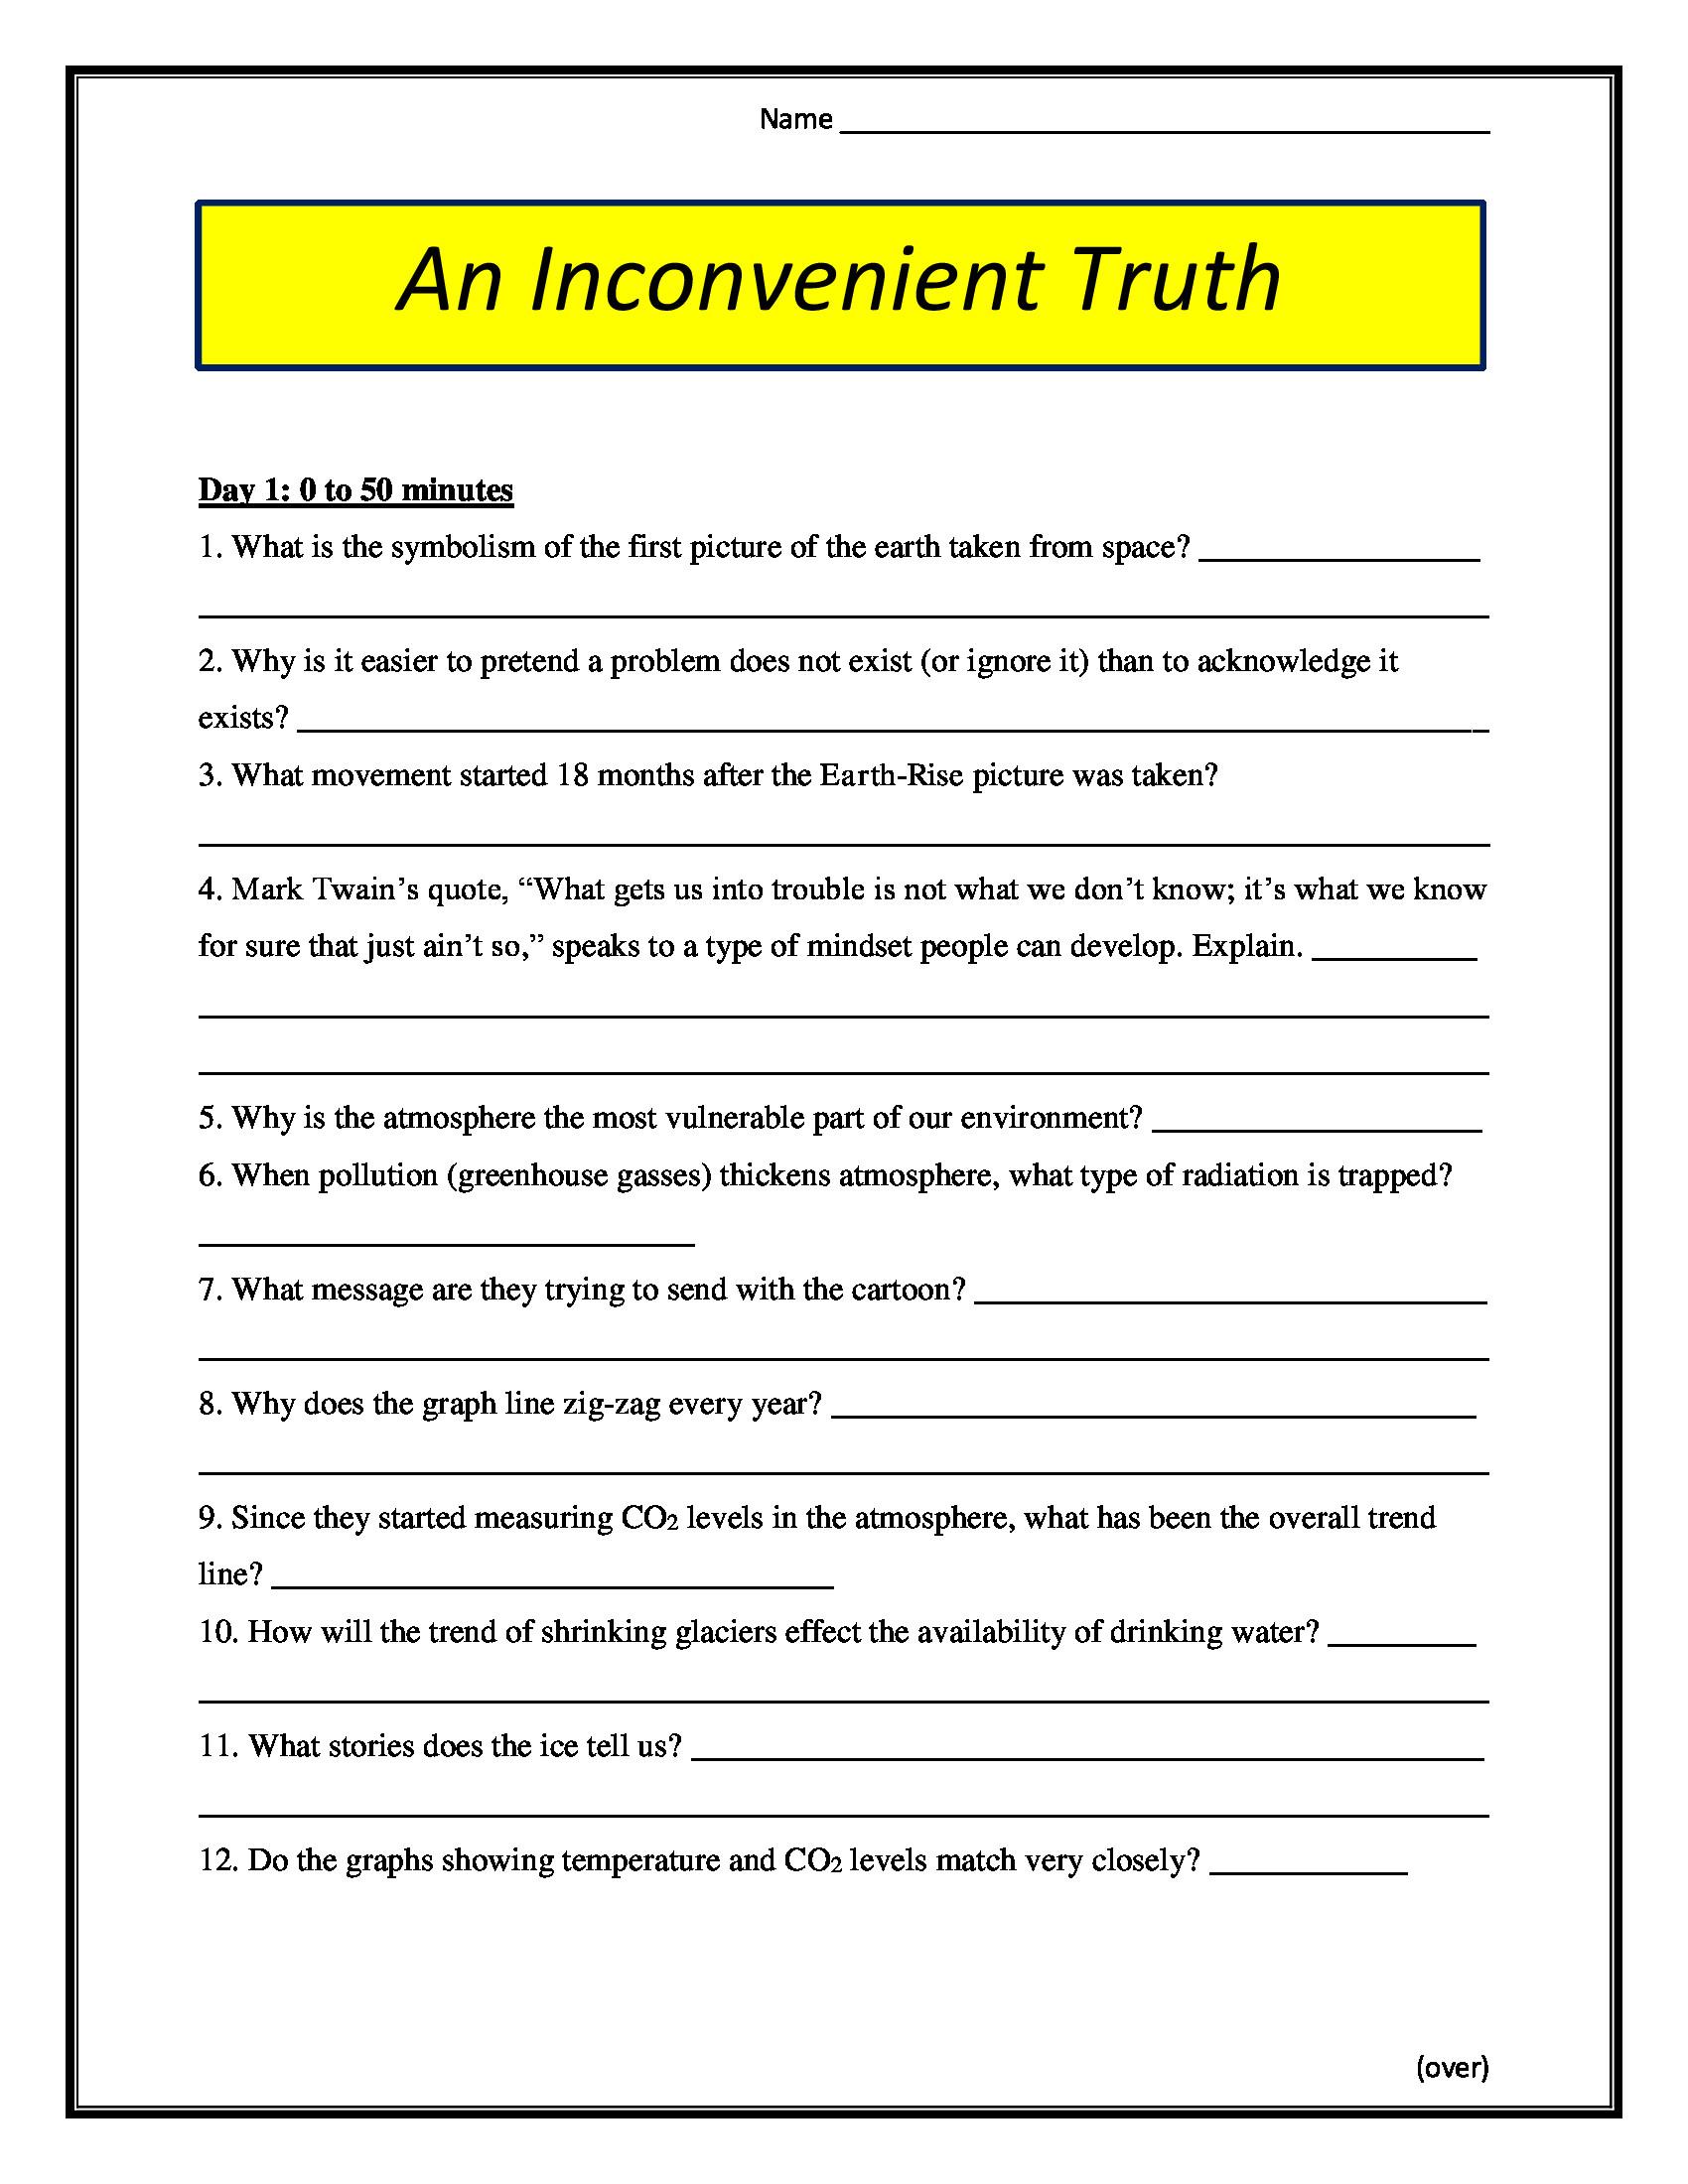 An Inconvenient Truth Worksheet